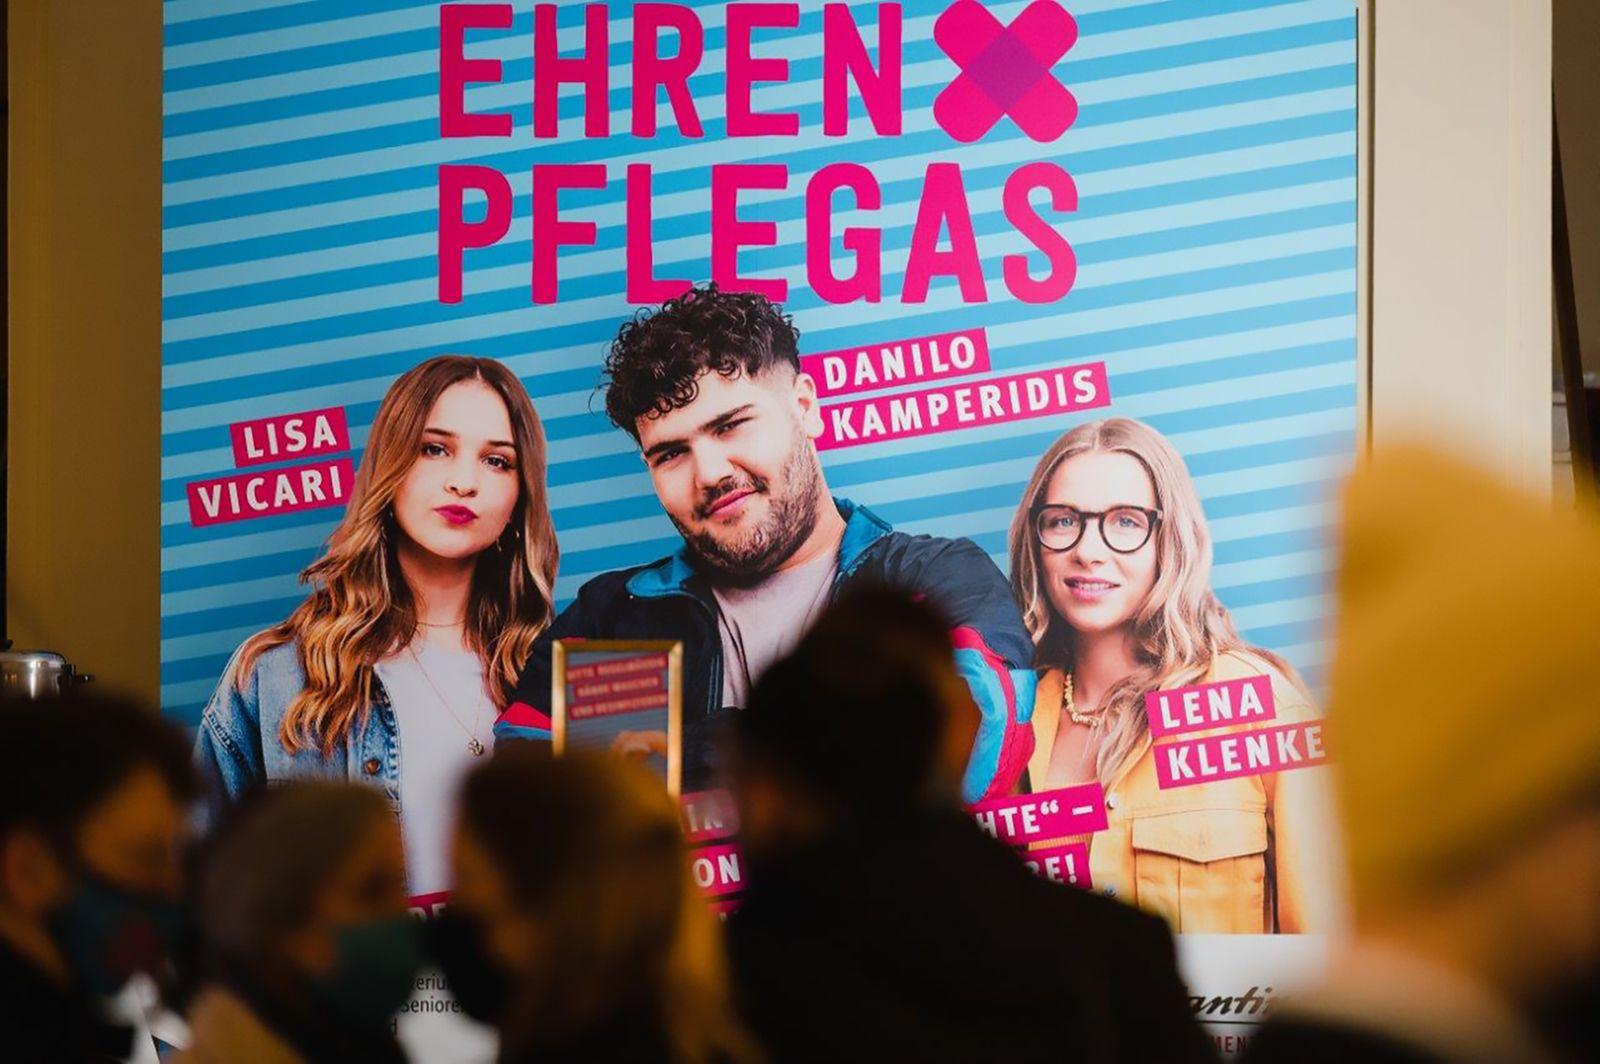 Ehrenpflegas / Premiere